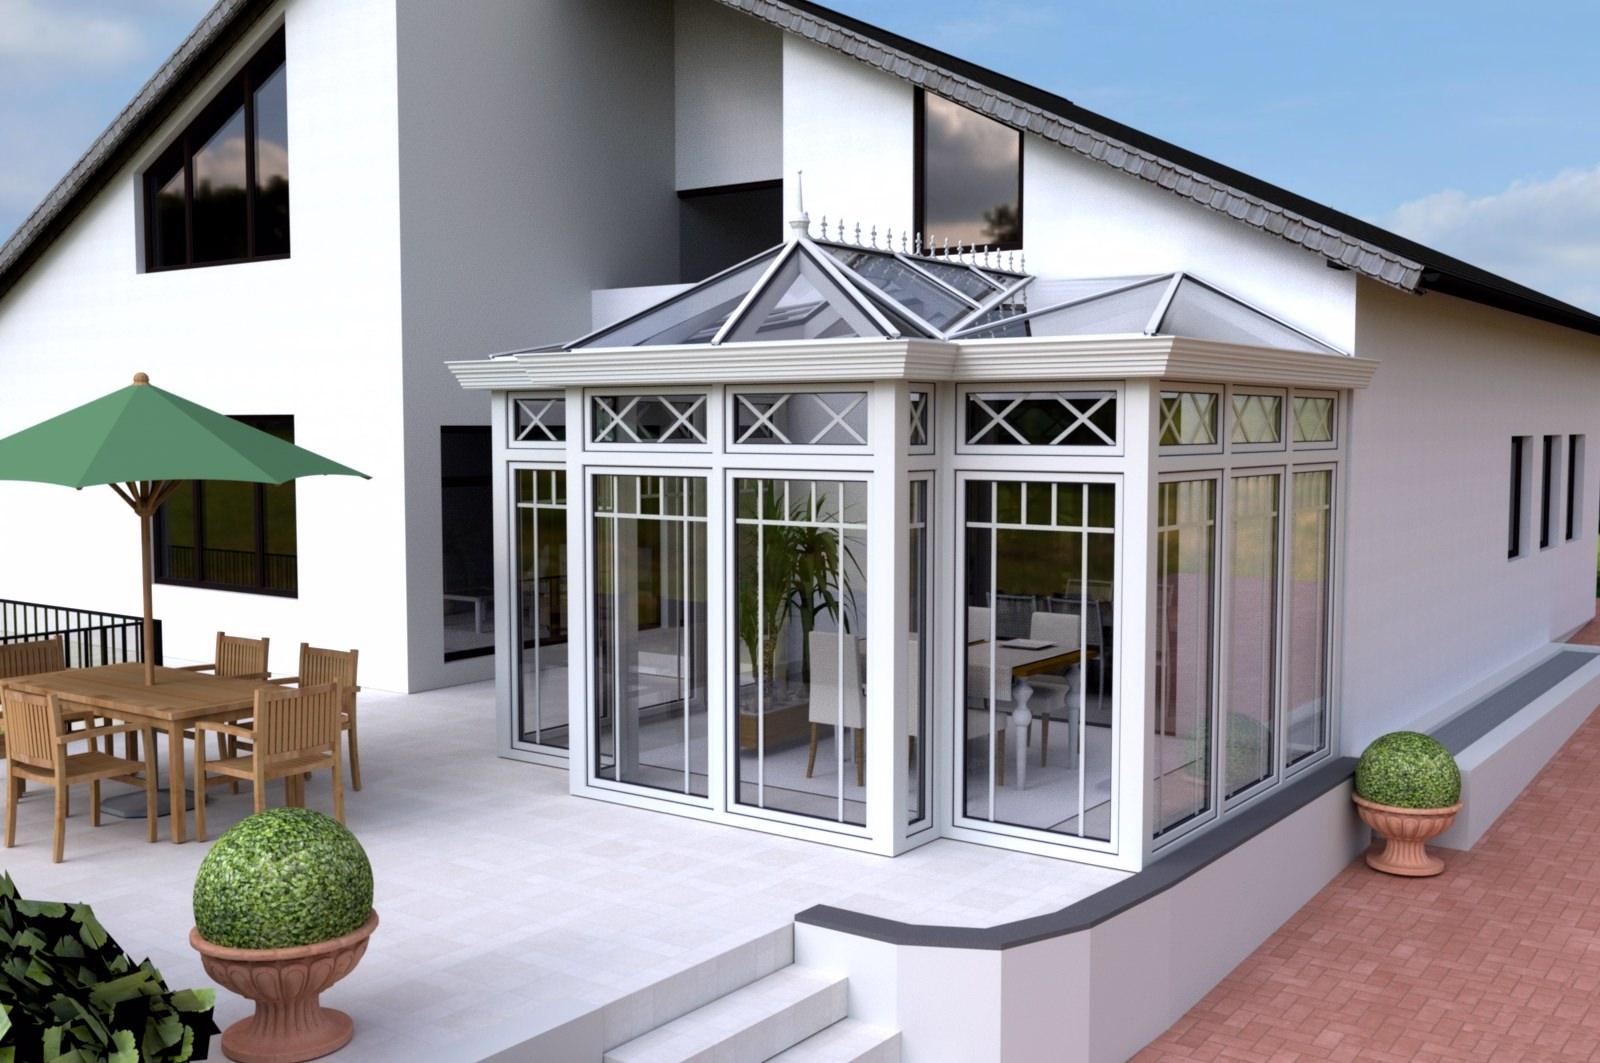 wintergarten ideen viktorianisch krenzer wintergarten. Black Bedroom Furniture Sets. Home Design Ideas